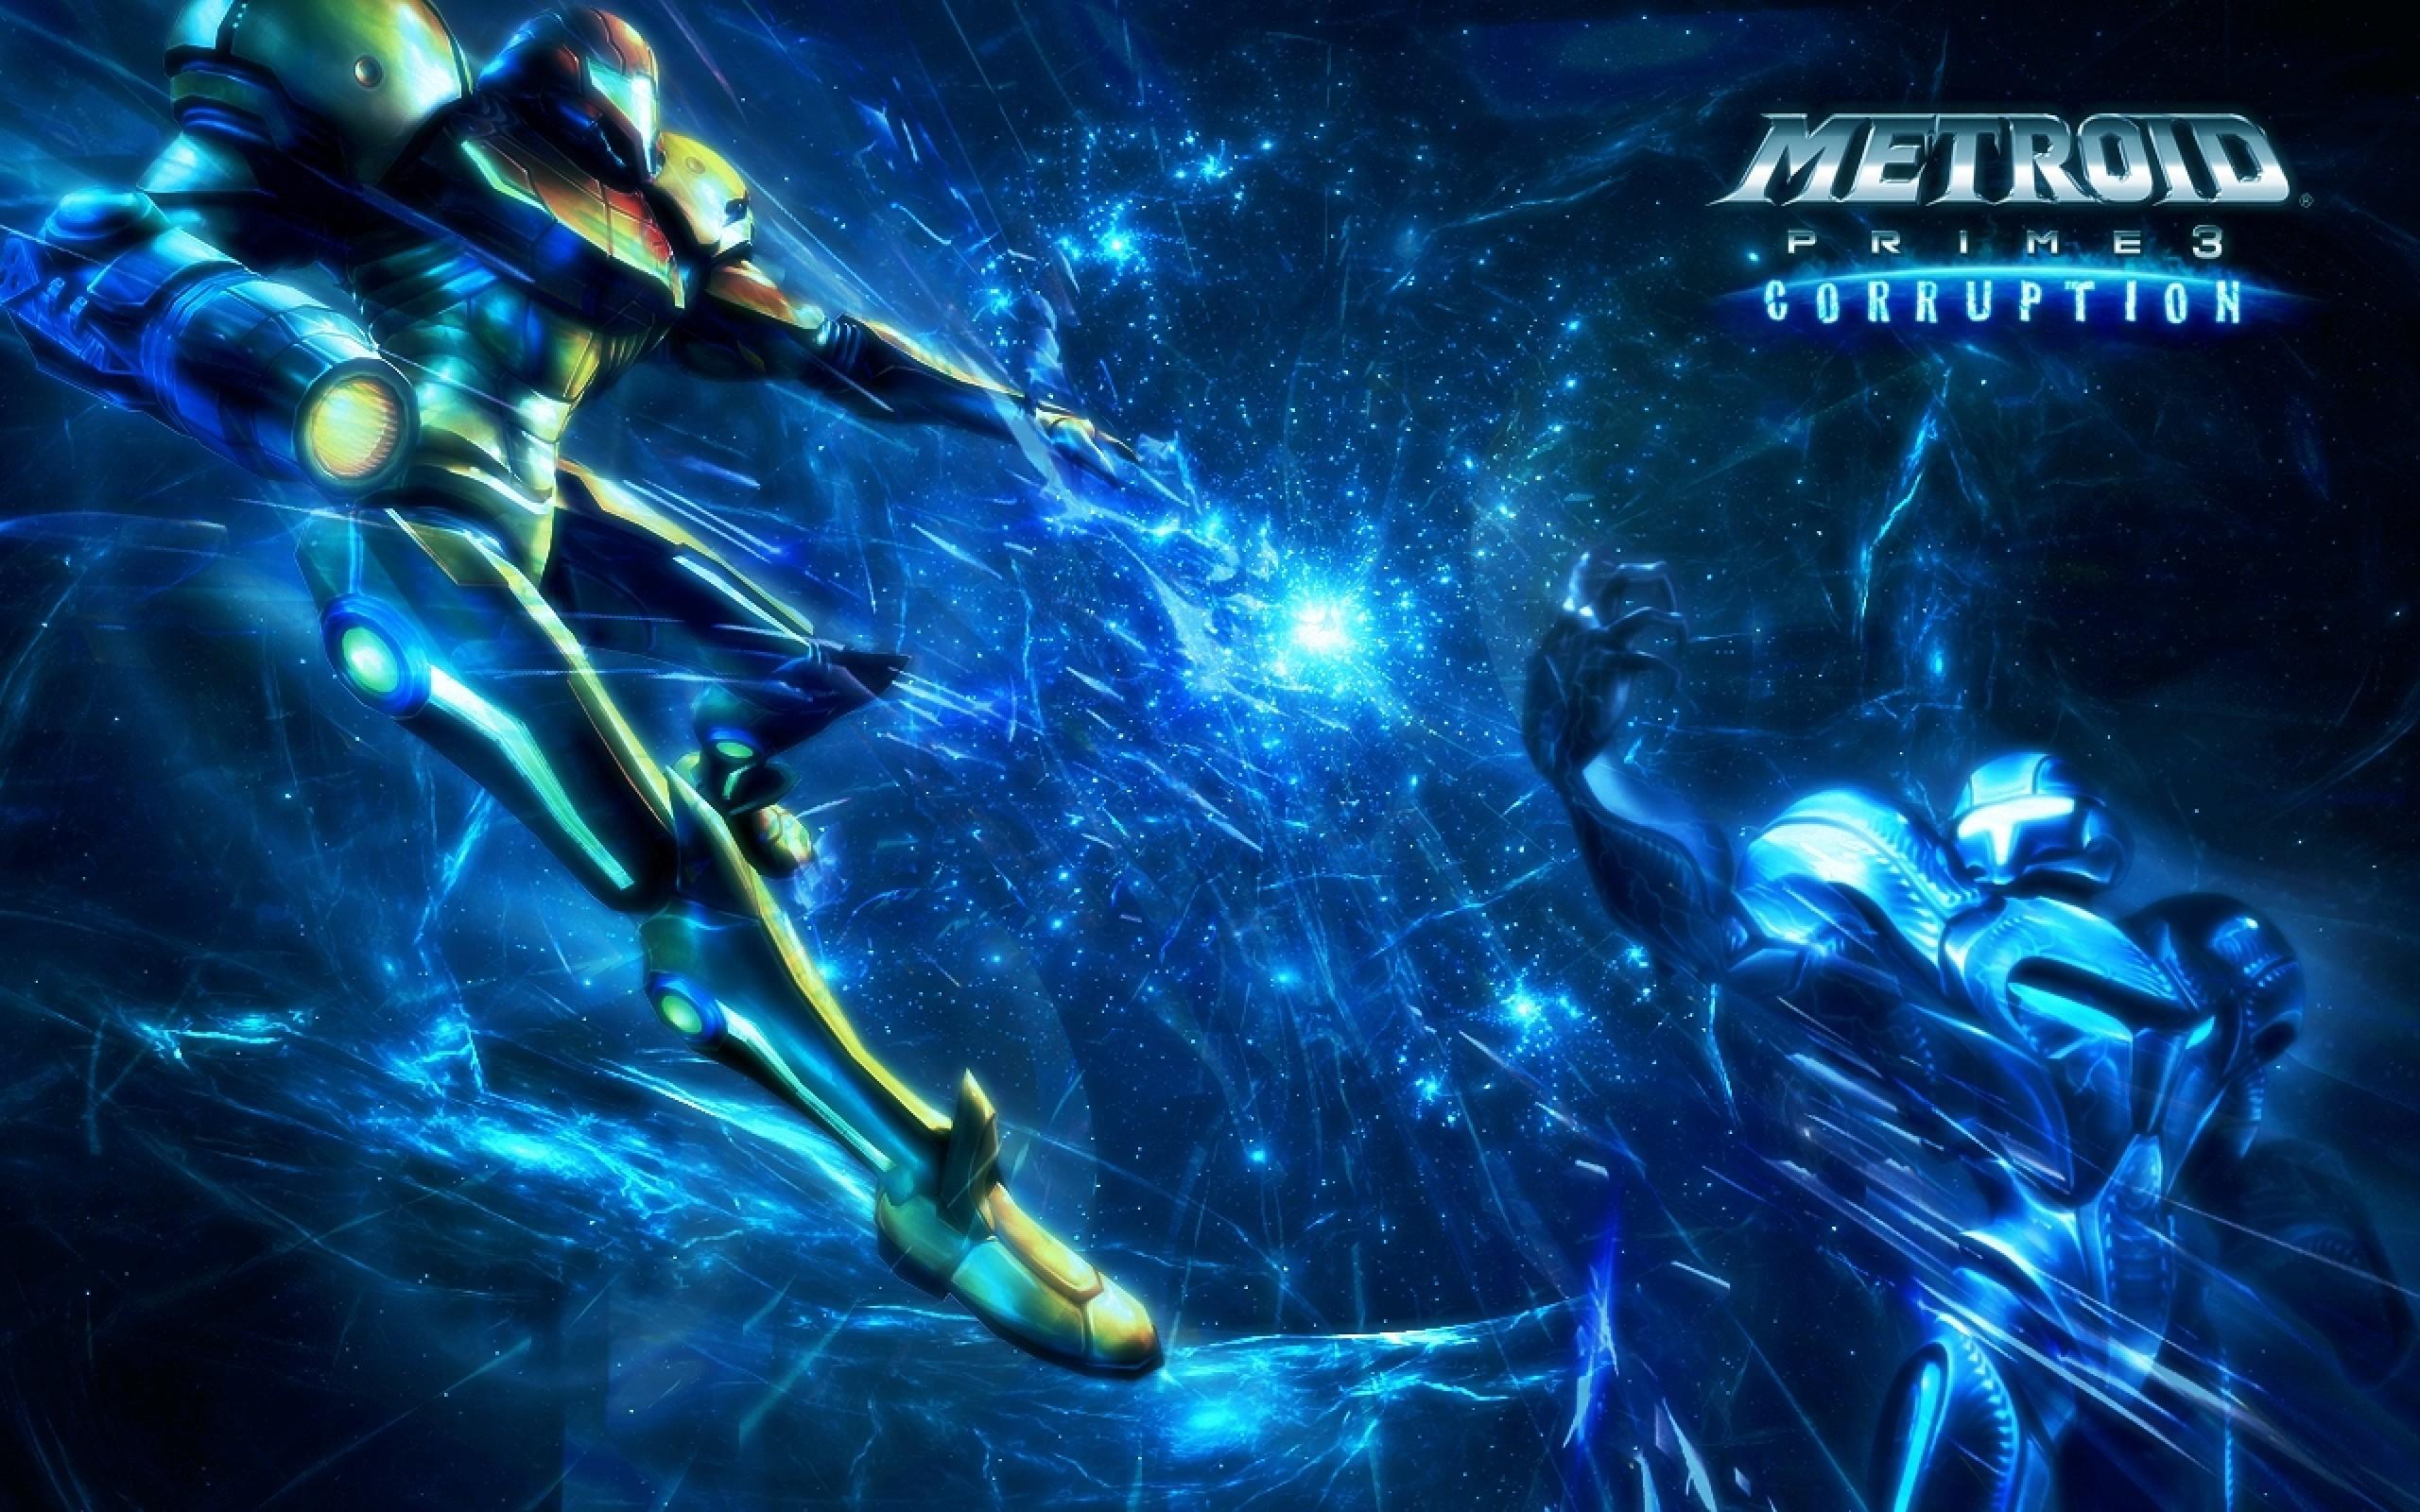 women video games black robots samus aran mechanical metroid prime aliens  metorid prime 1280×800 Art HD